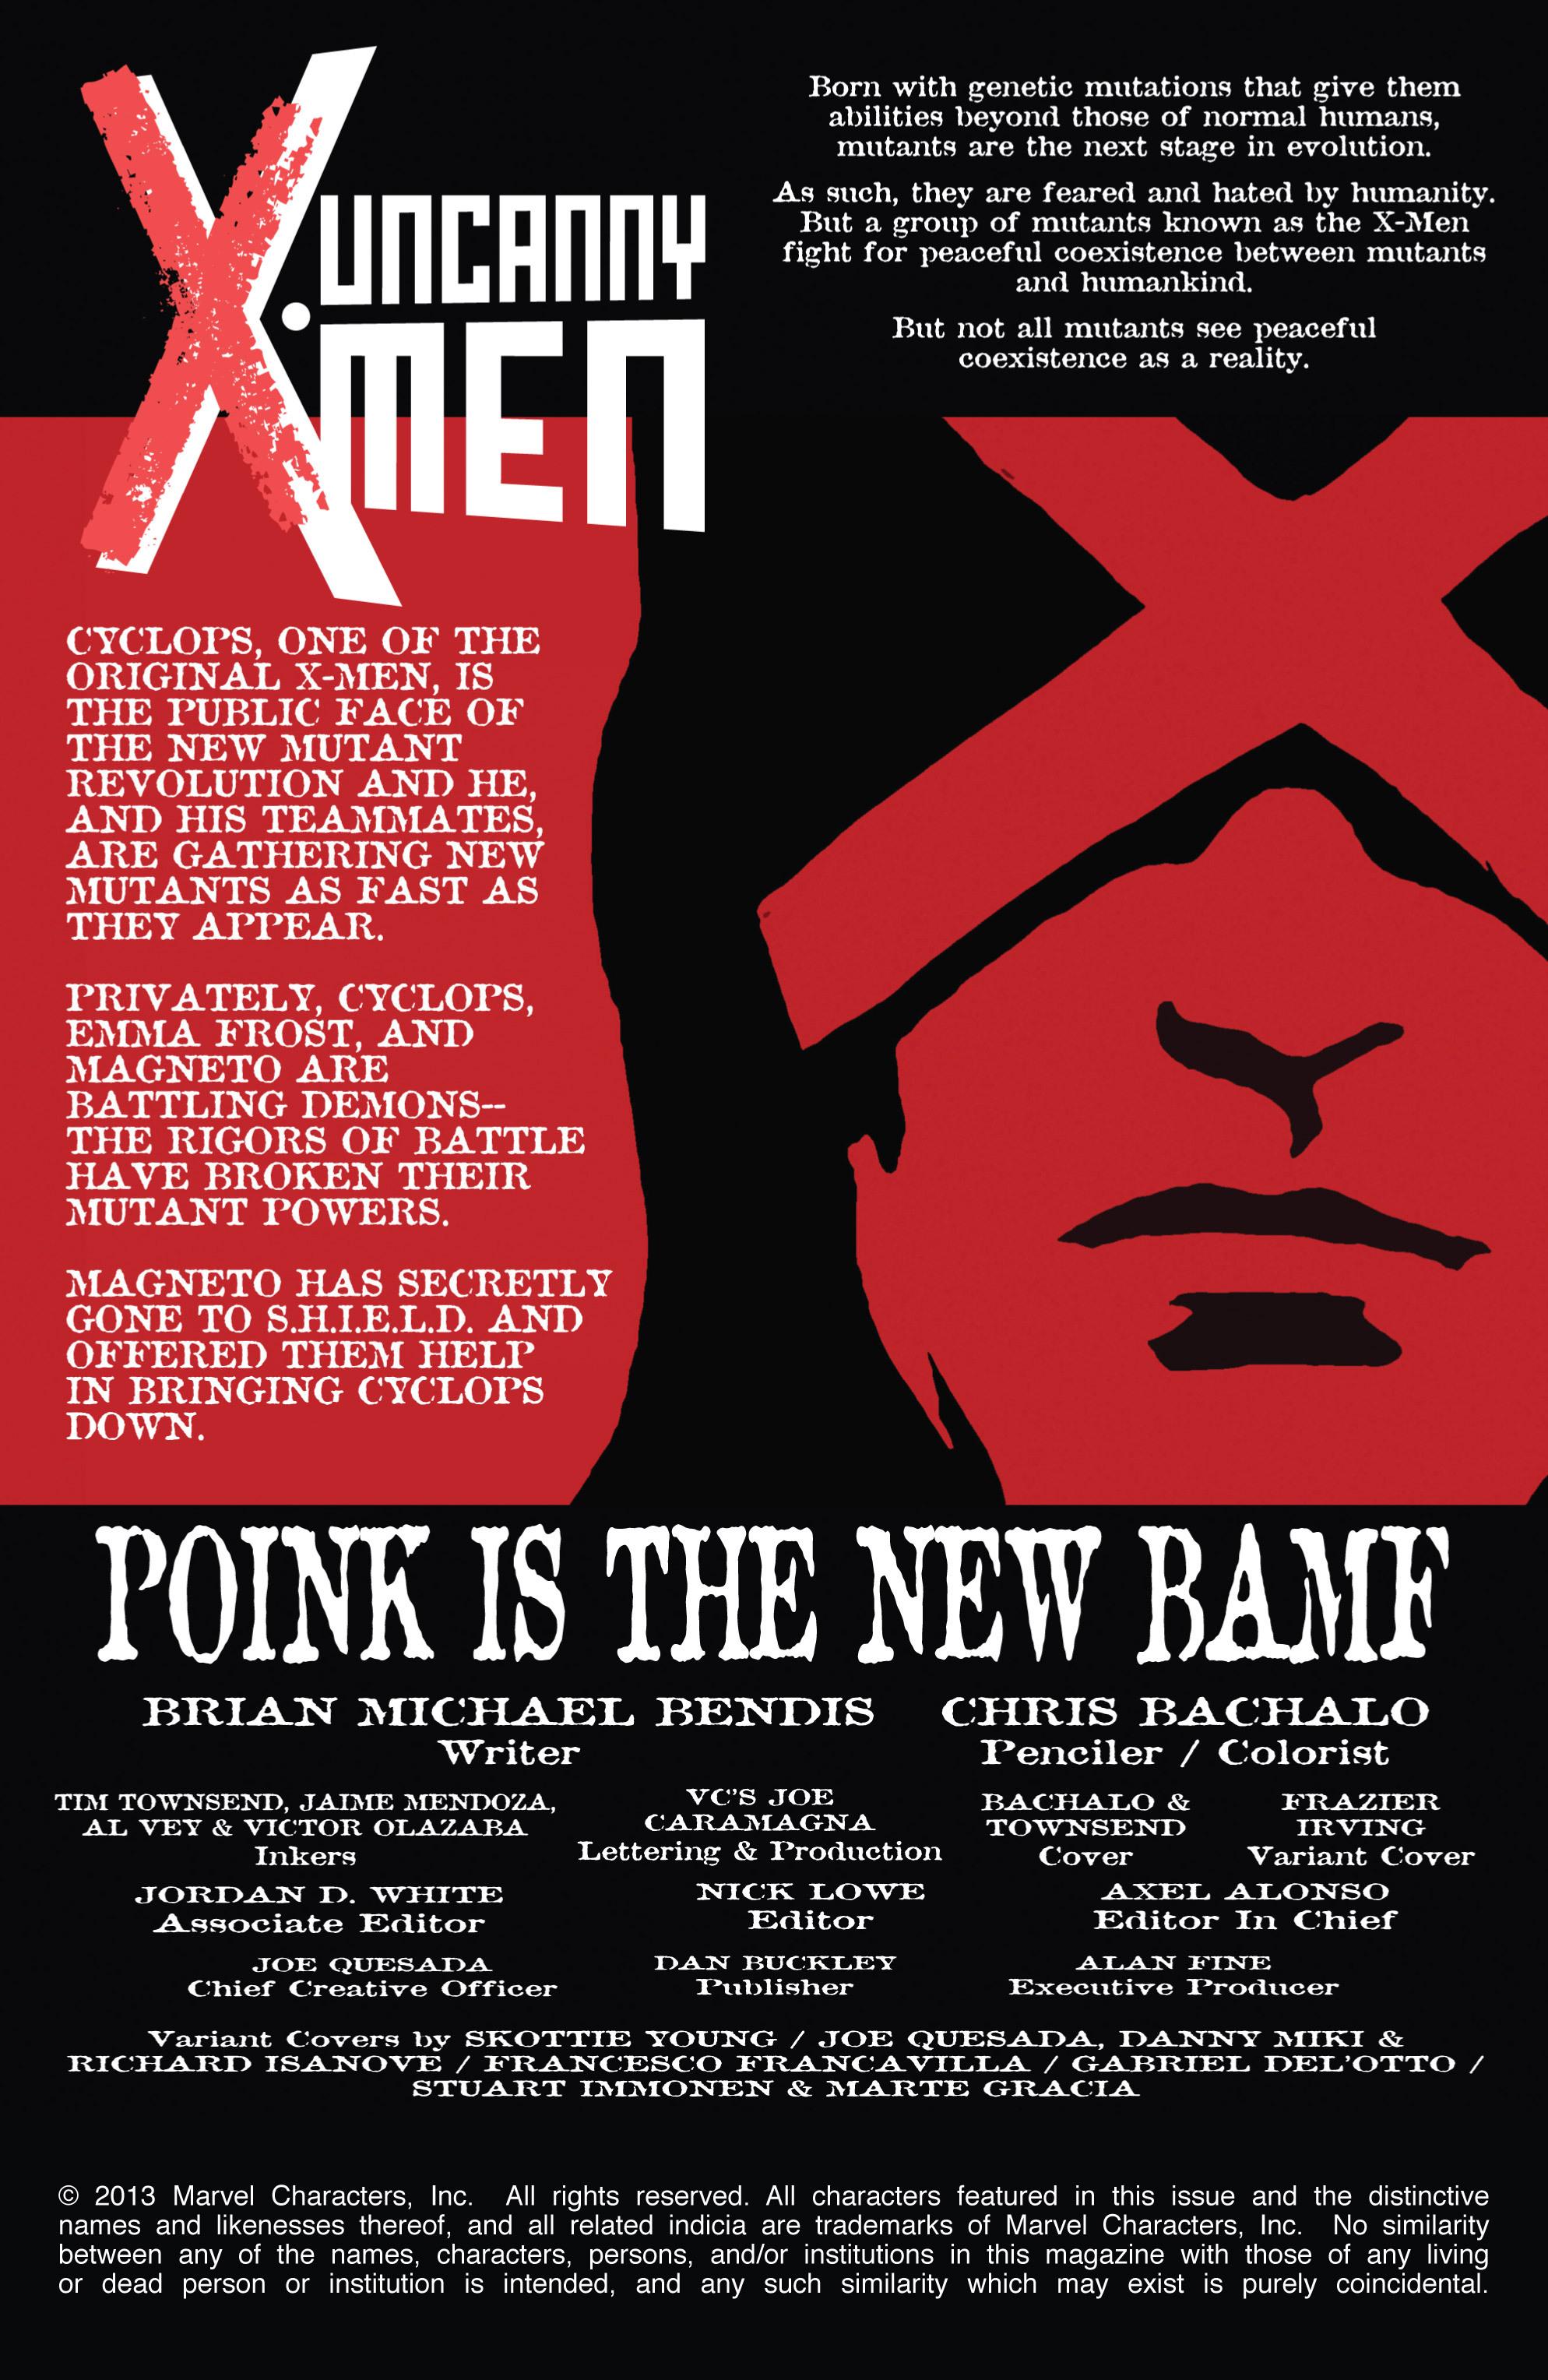 Read online Uncanny X-Men (2013) comic -  Issue # _TPB 1 - Revolution - 26